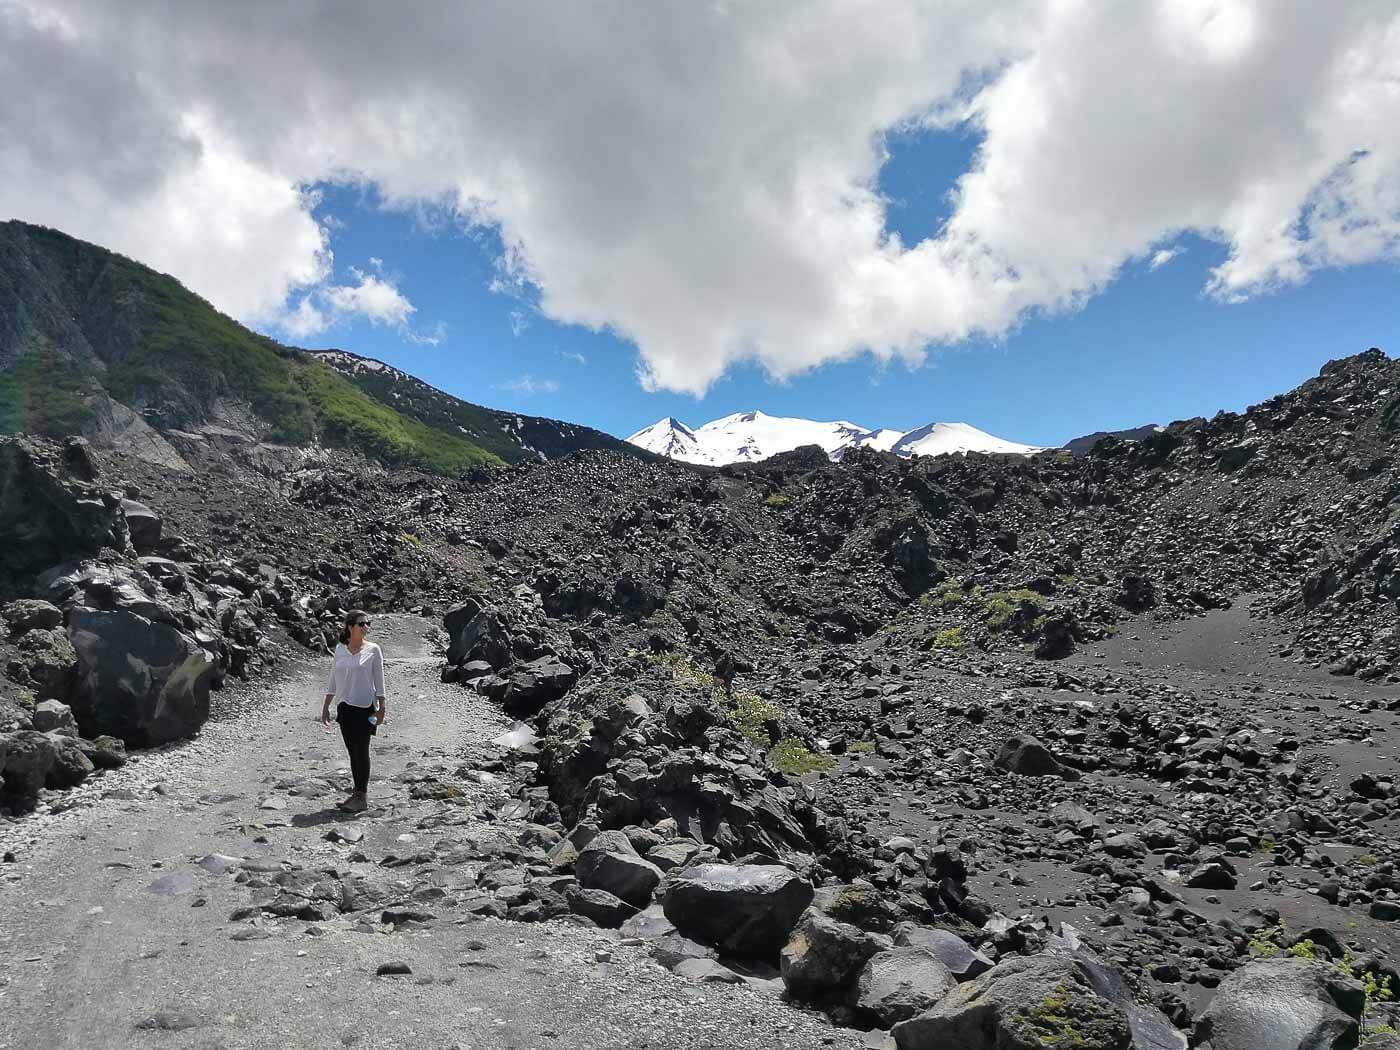 O que fazer em Chillán Neve Termas de Chillán - Trekking 2